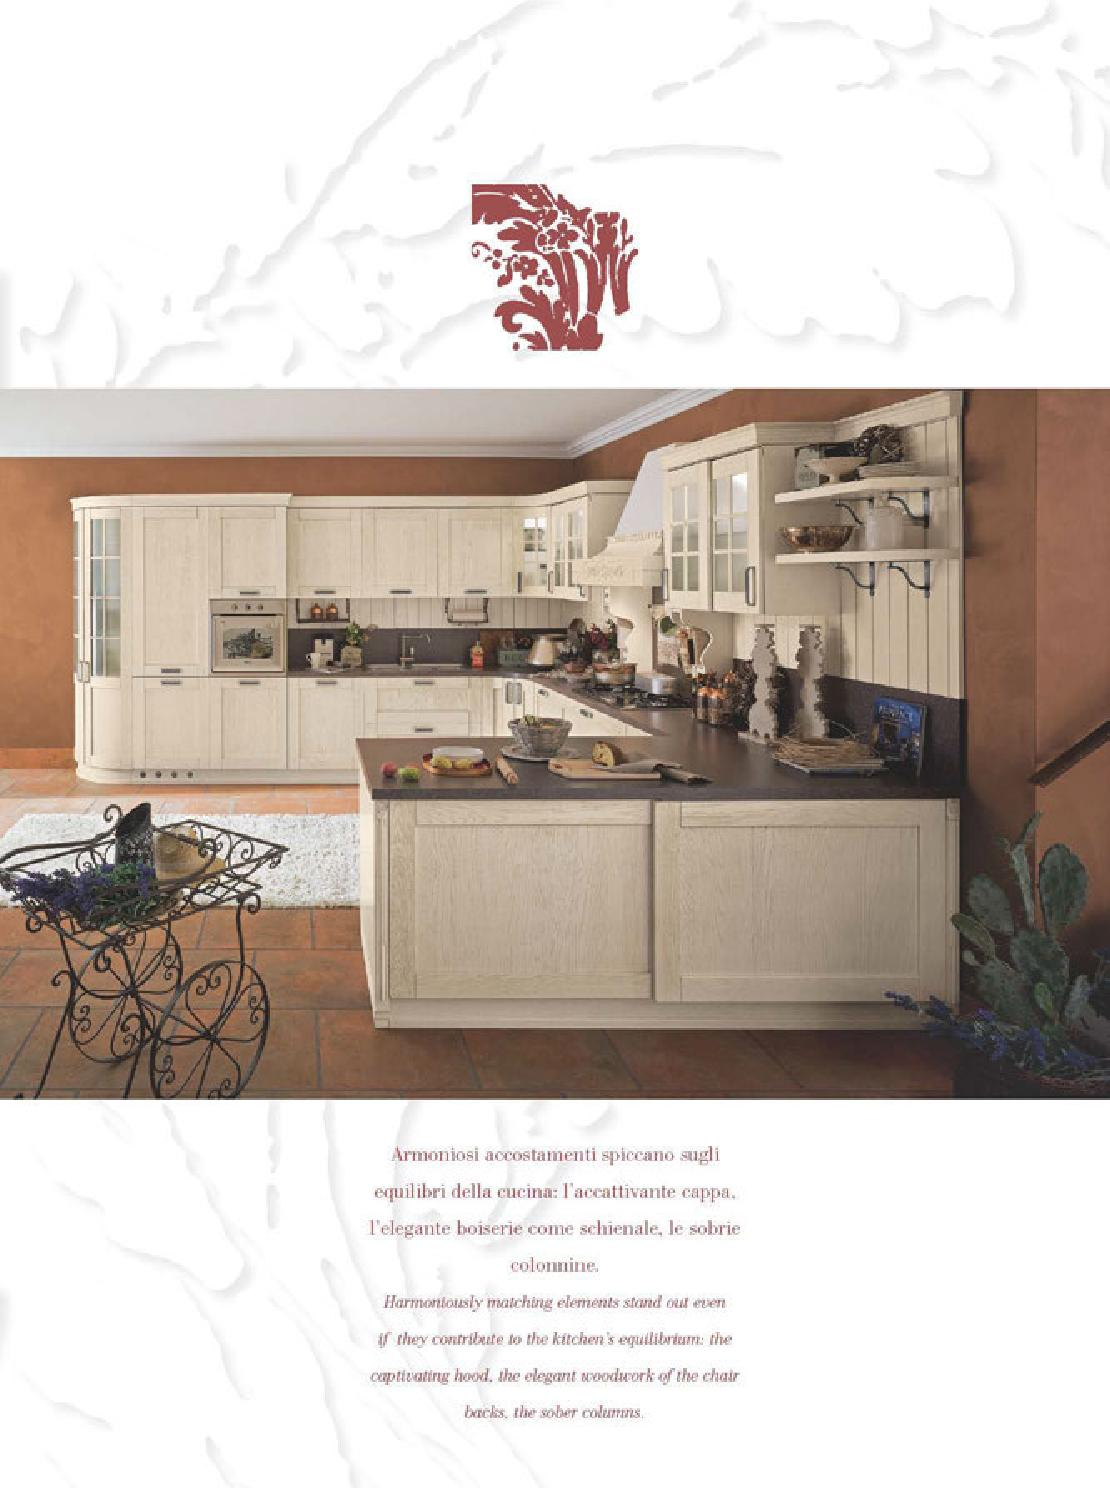 Accostamenti In Cucina collezione classica - signoressa classico | vebuka